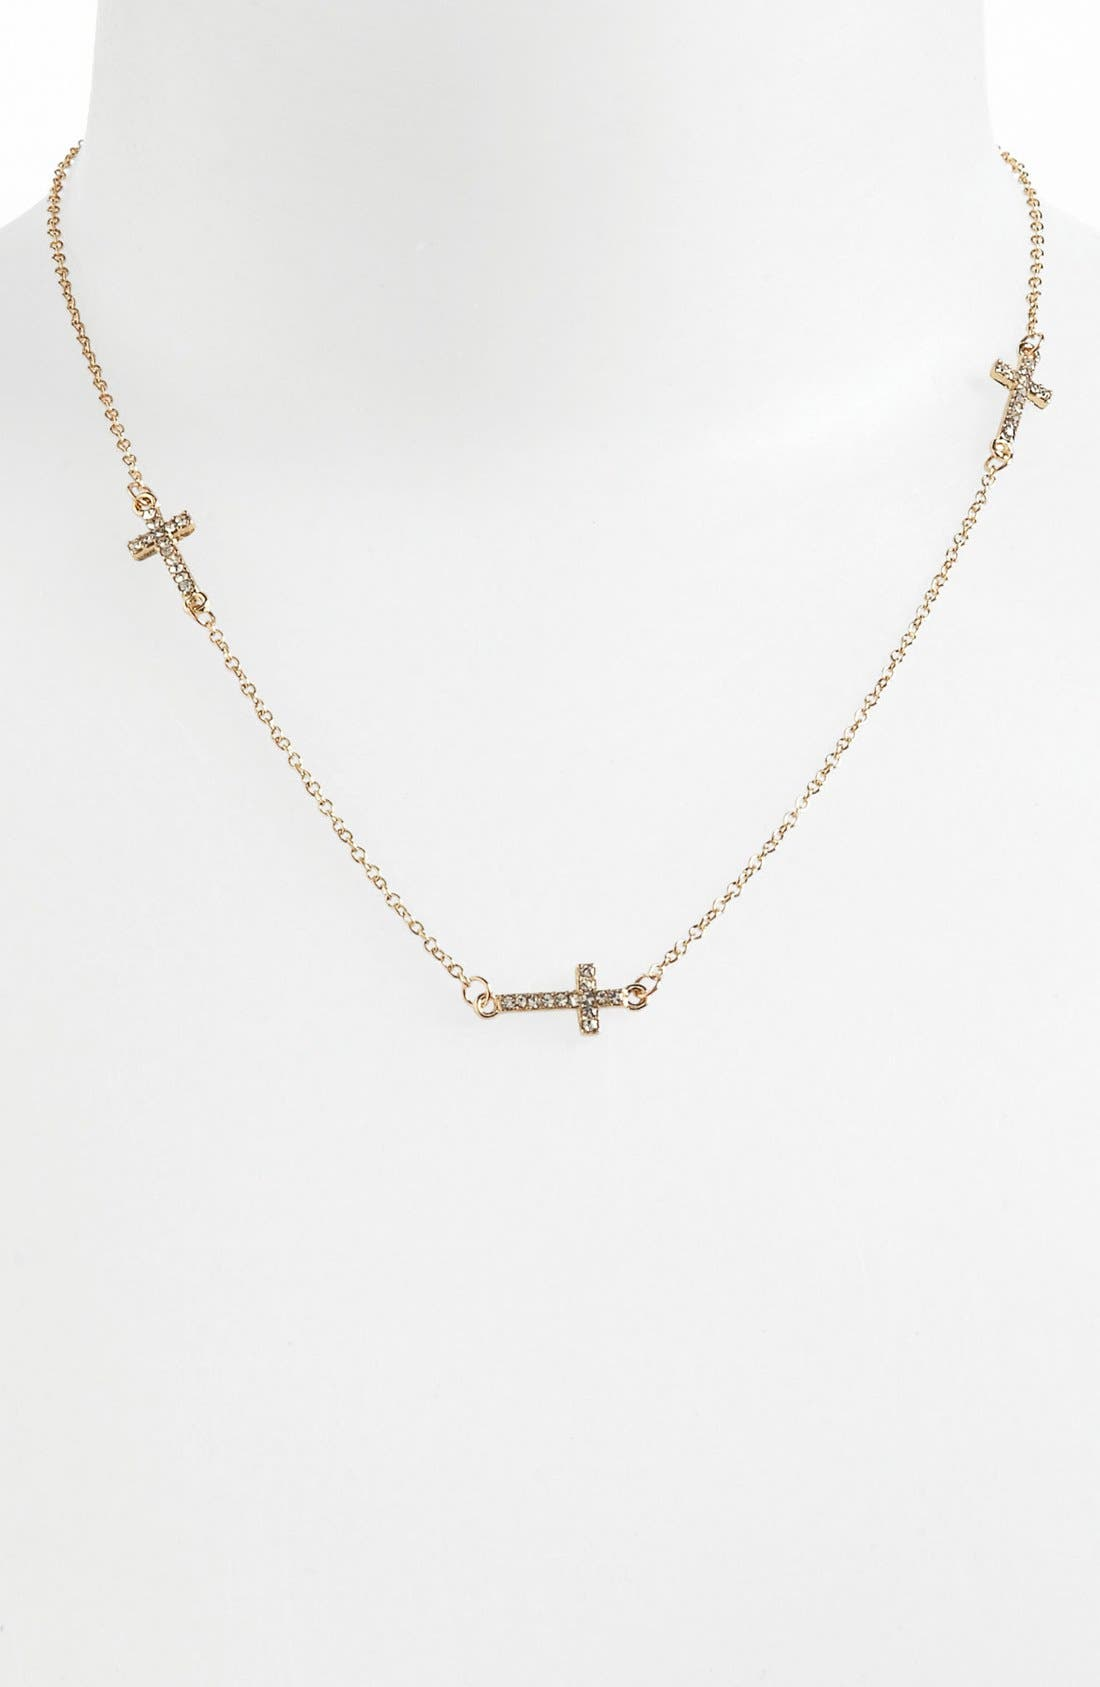 Alternate Image 1 Selected - Devan 'Dainty Cross' Necklace